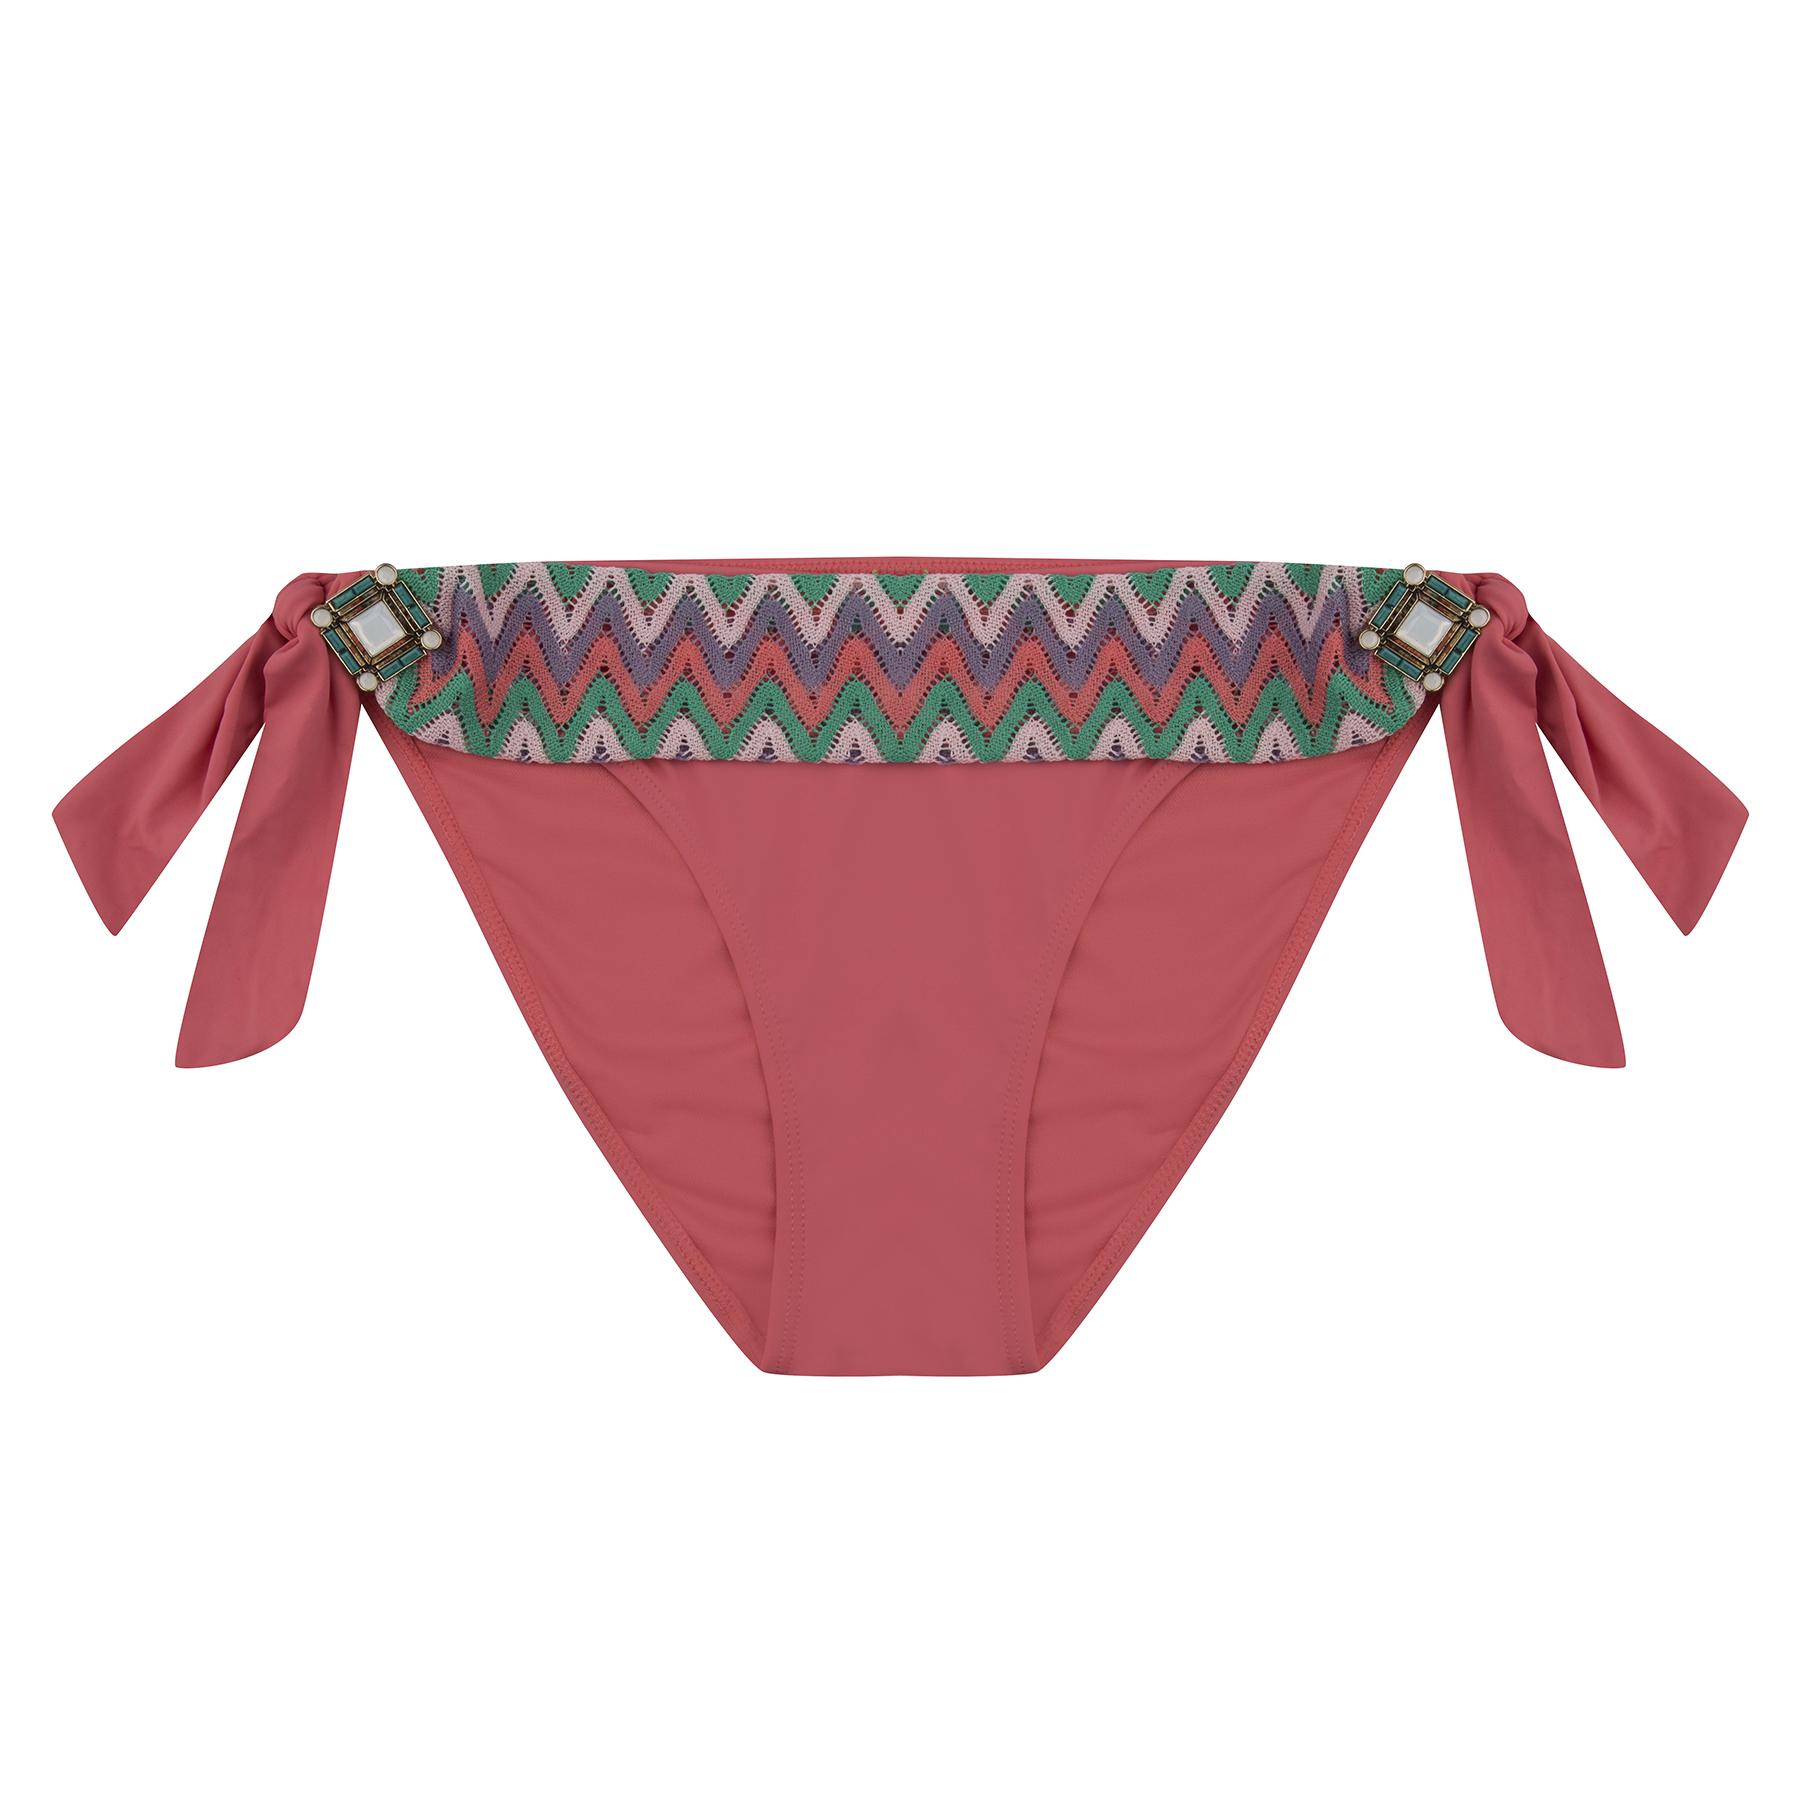 e892083dc3 BOHO bikini bottom - brilliant spacious aztec - coral - S - I Love BOHO